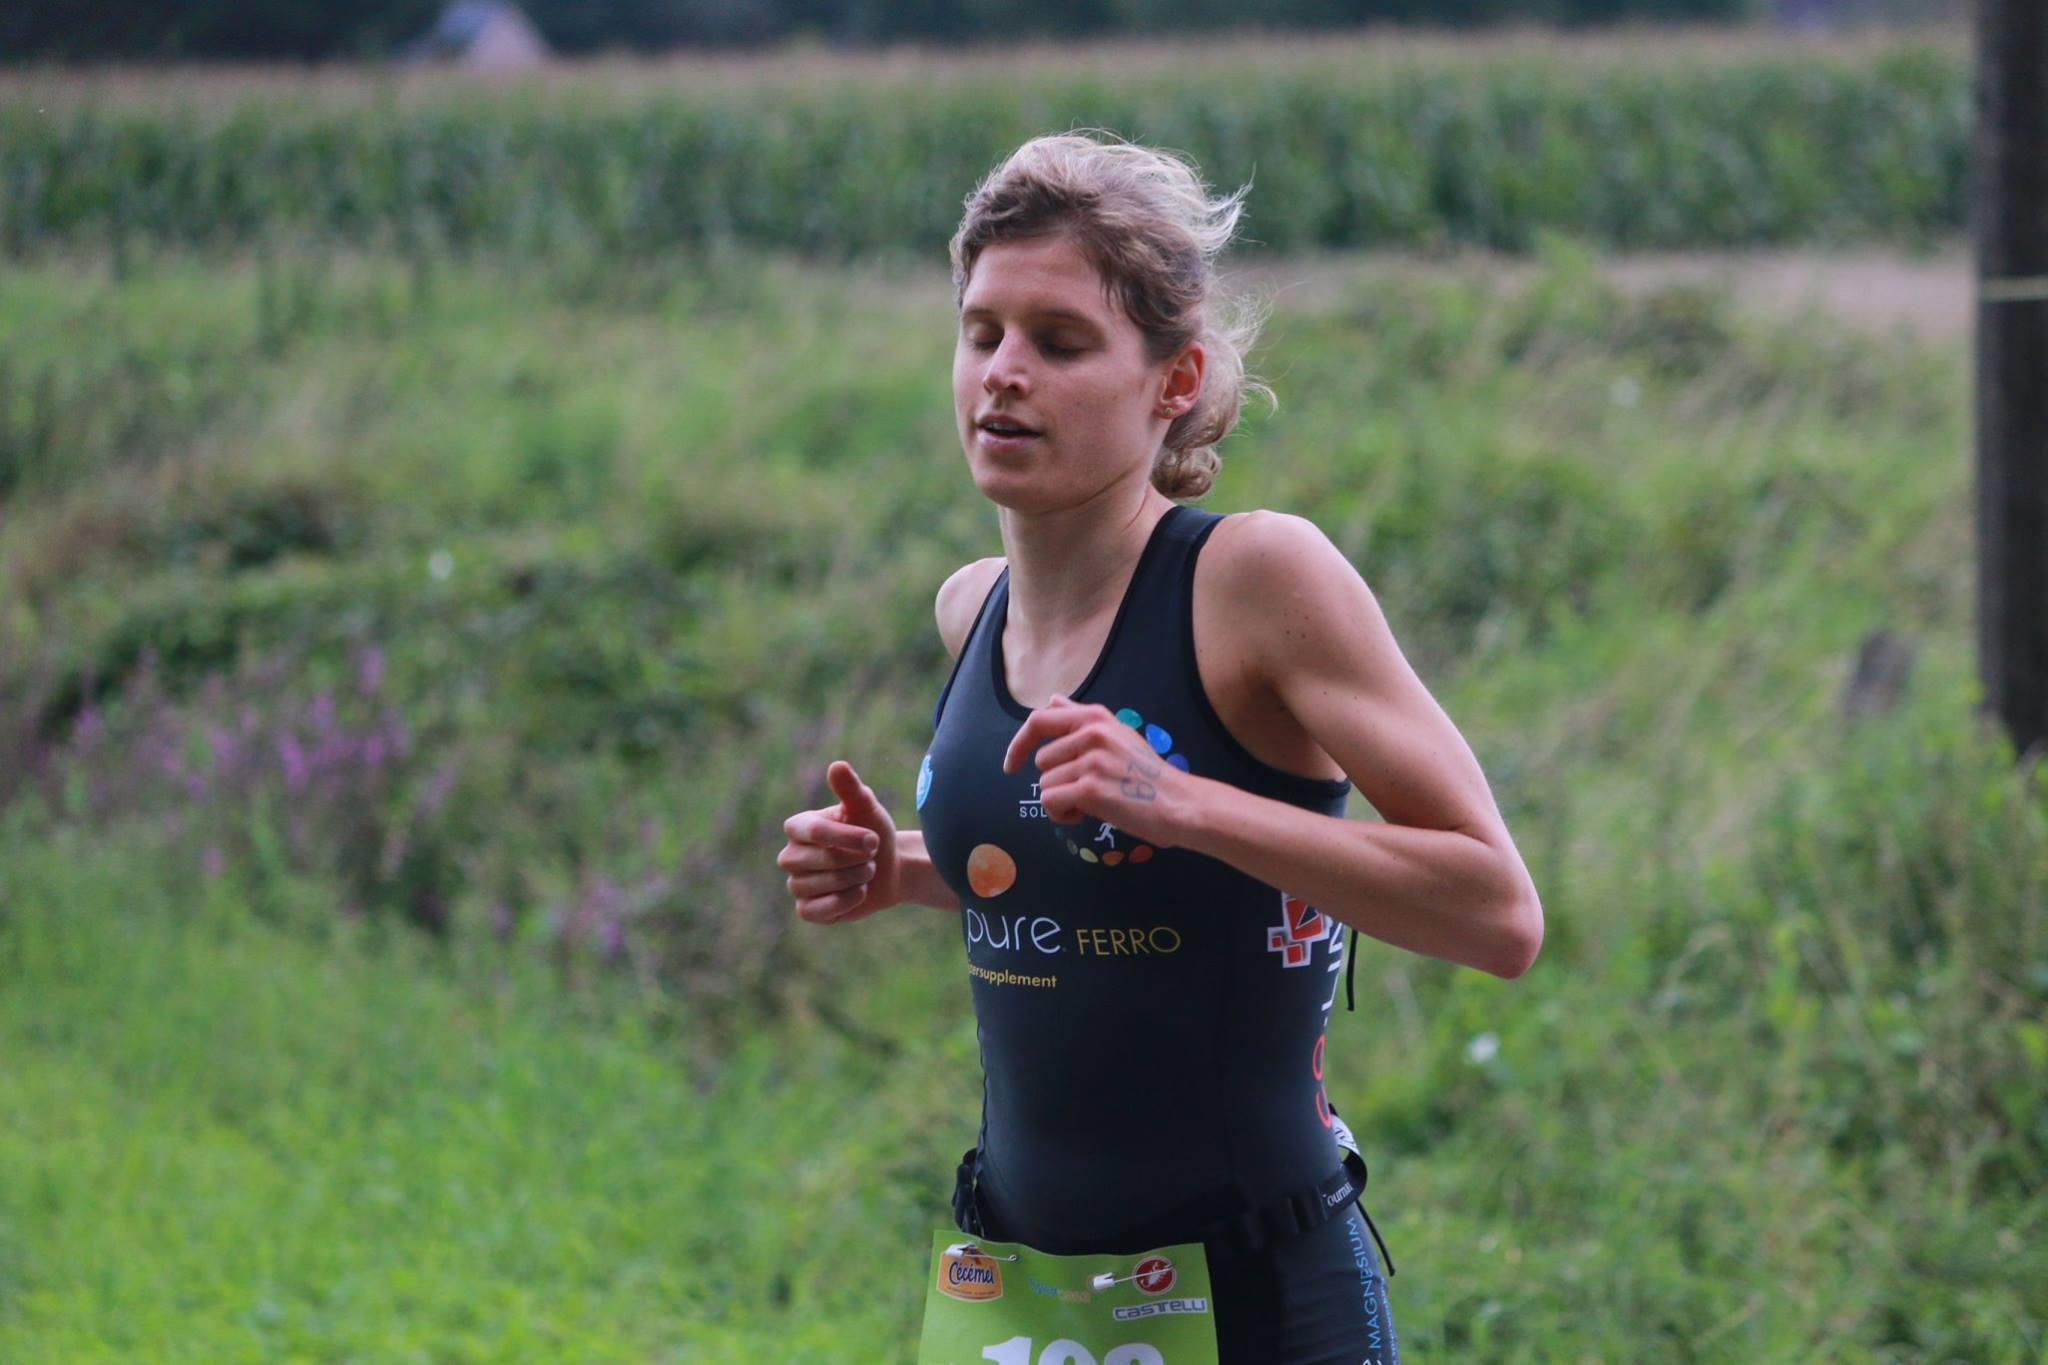 Katrien Maes van start tot finish aan de leiding (foto: Chris Hofkens)